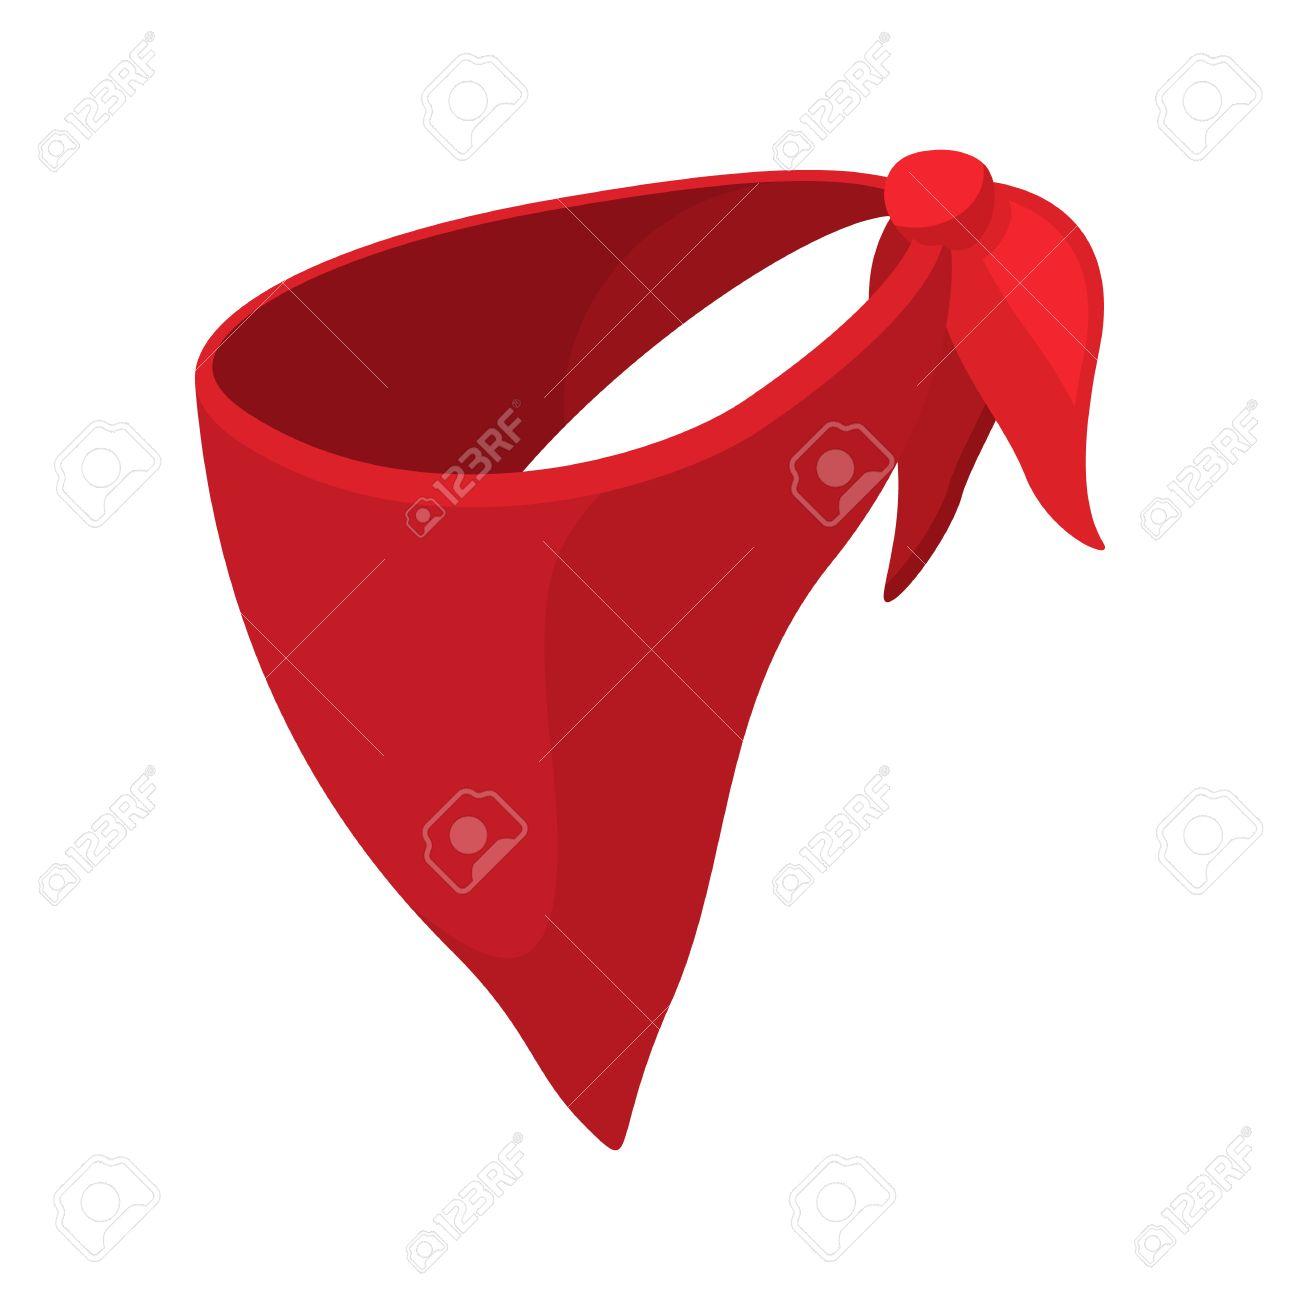 3713ed62ca0 Cowboy neckerchief cartoon icon on a white background Stock Vector -  52132808